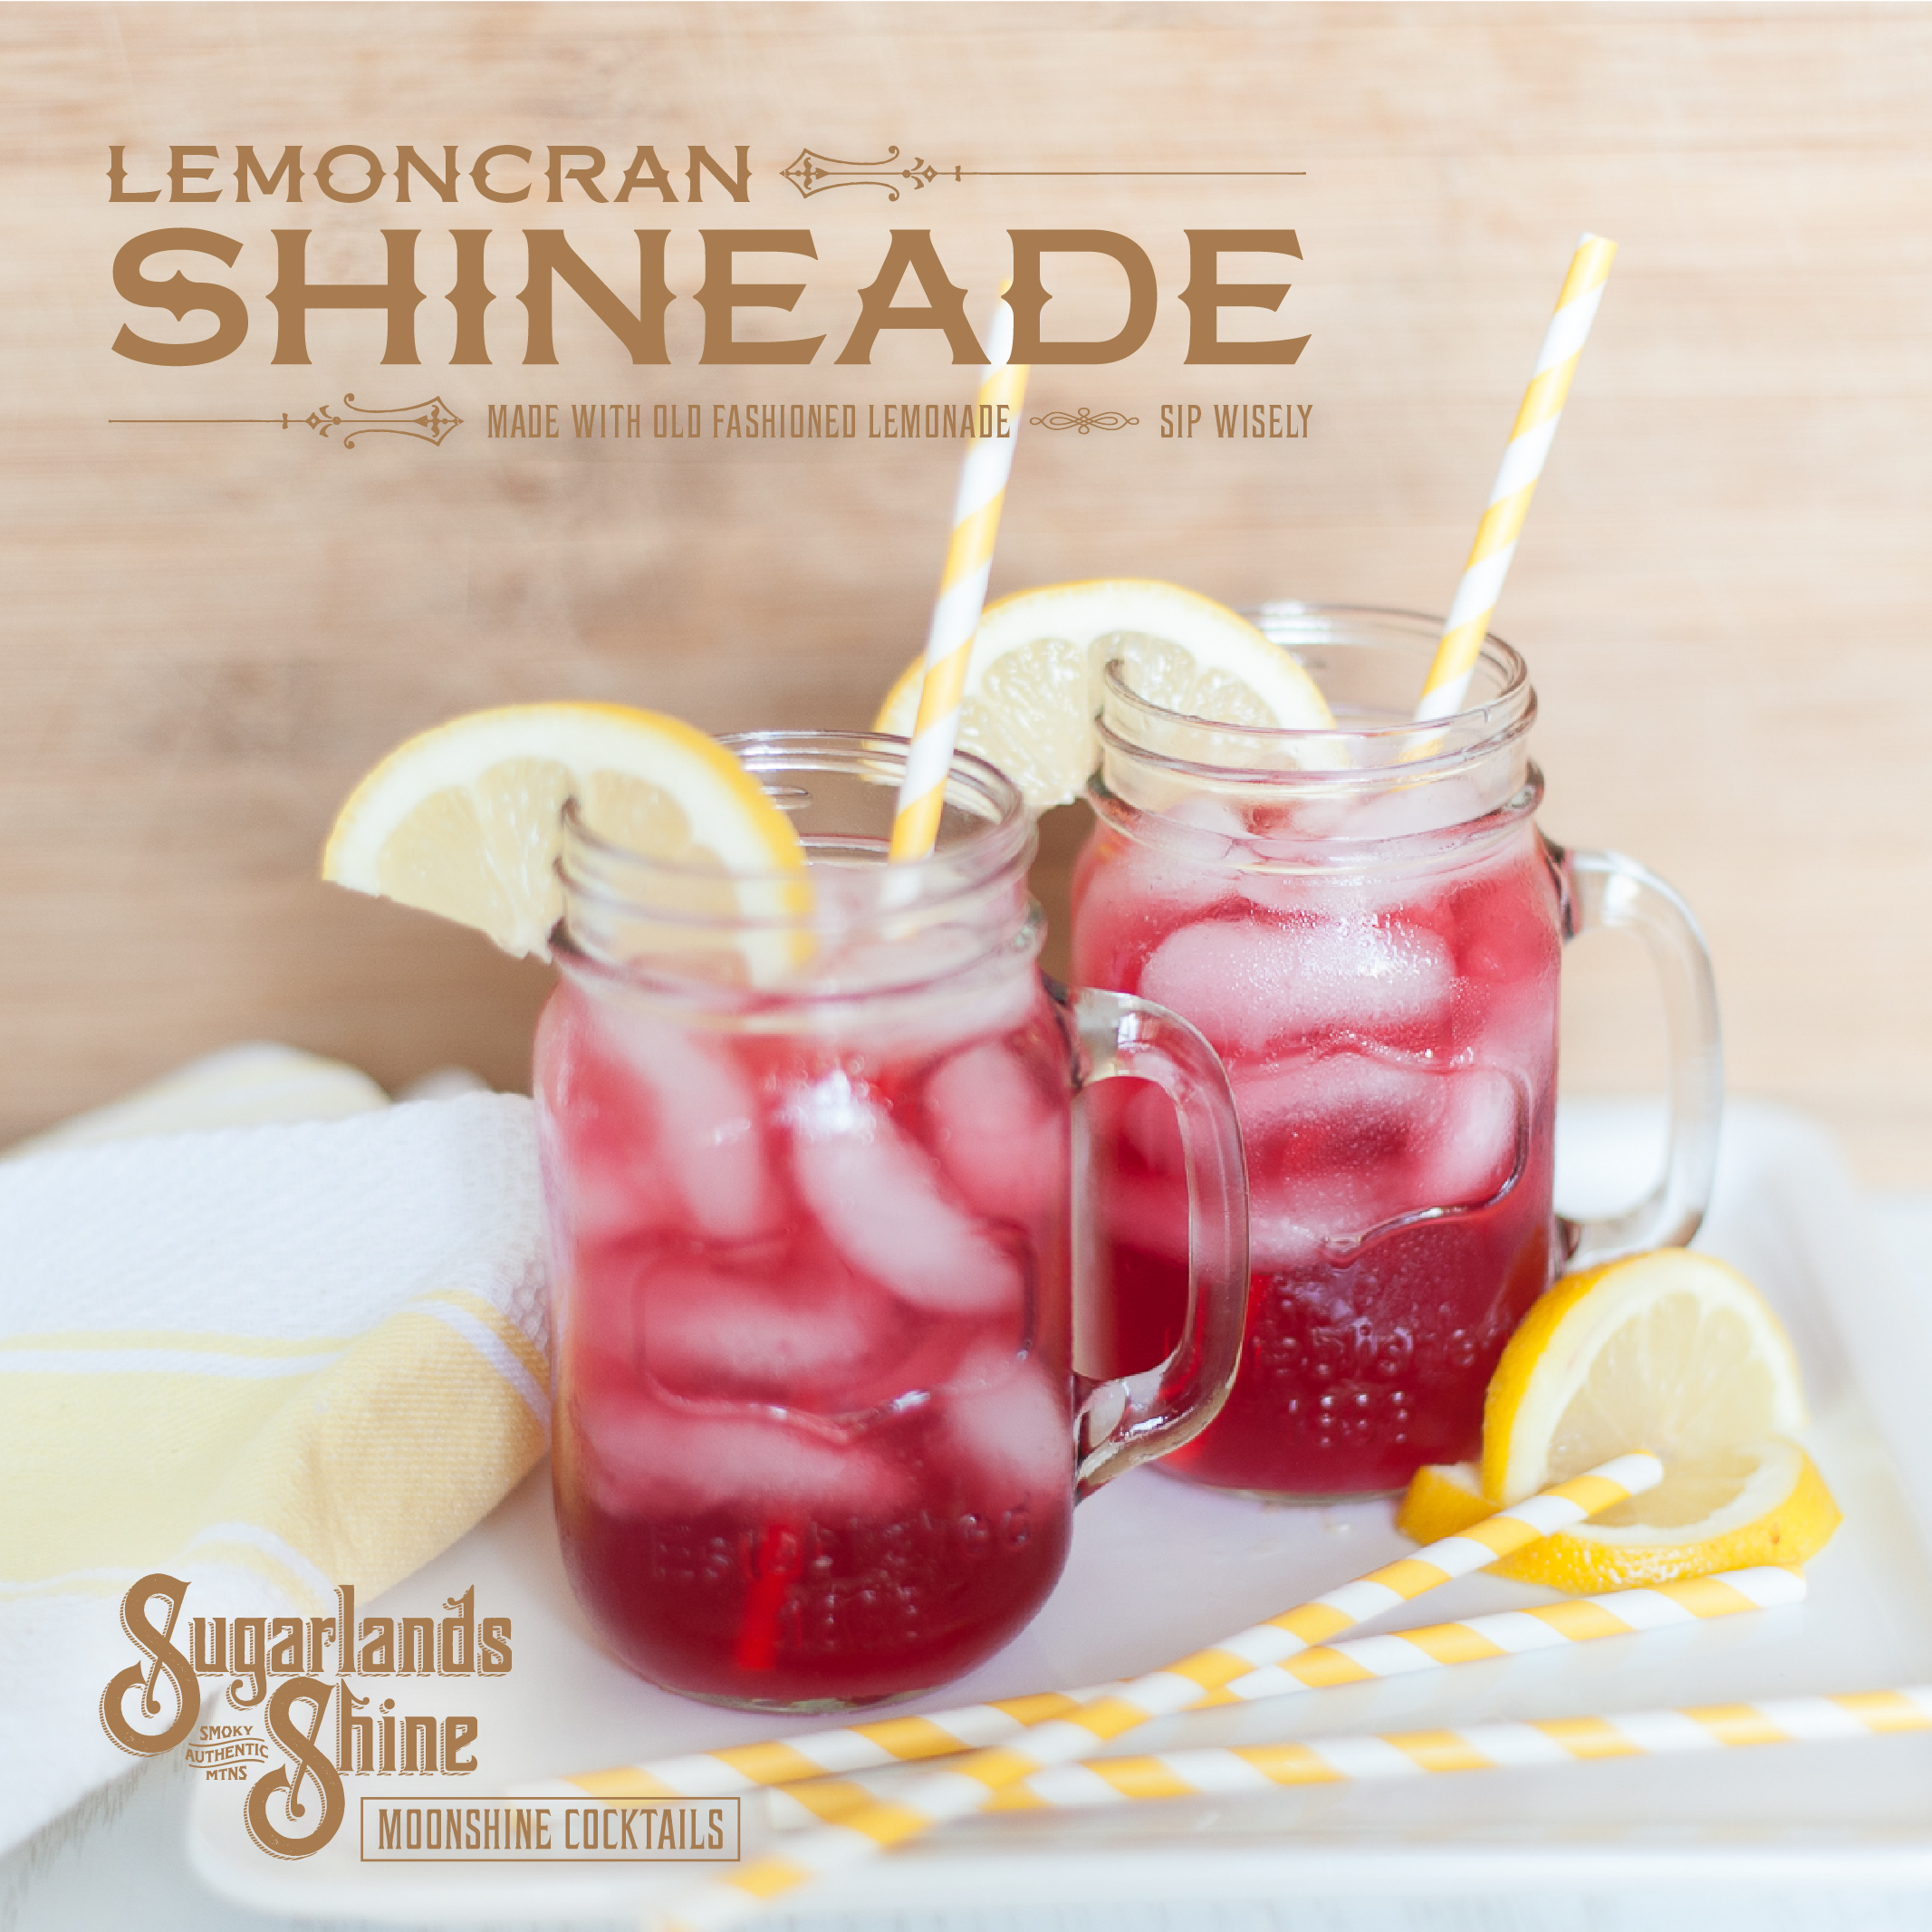 Twitter - LemonCran Shineade